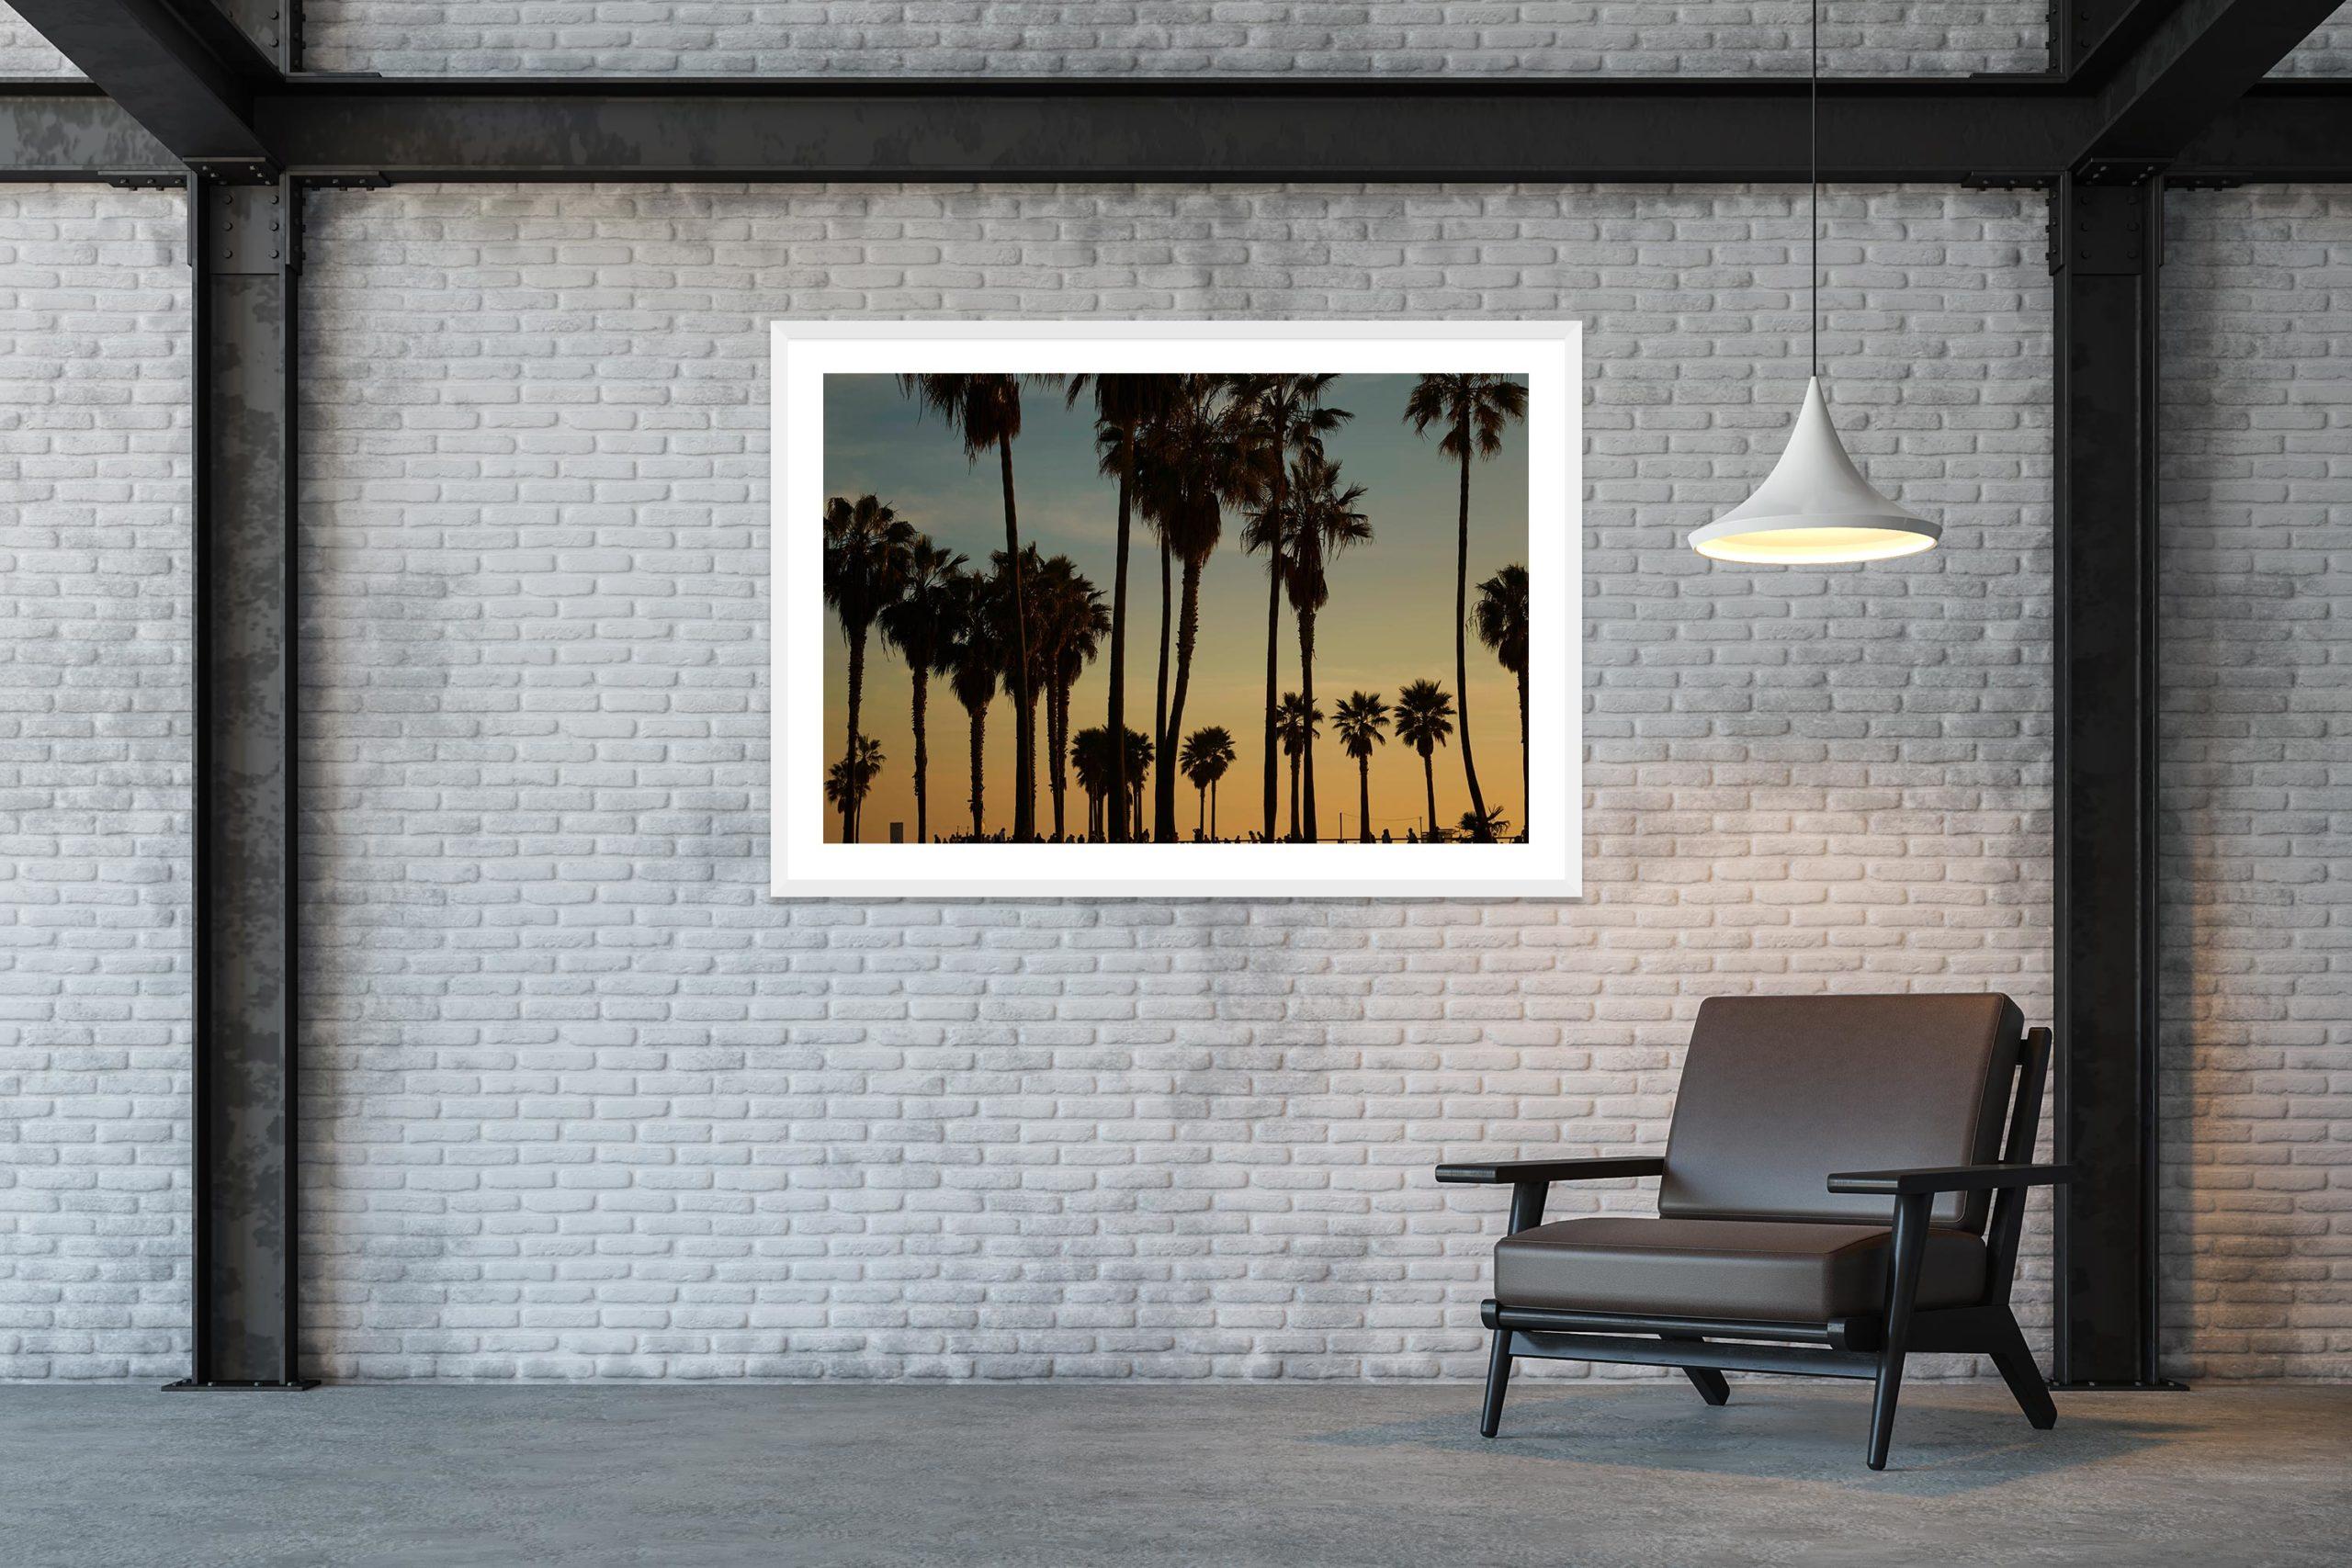 Palms - White Frame - Skate Park, Venice Beach Collection - Fine Art Photography by Toby Dixon